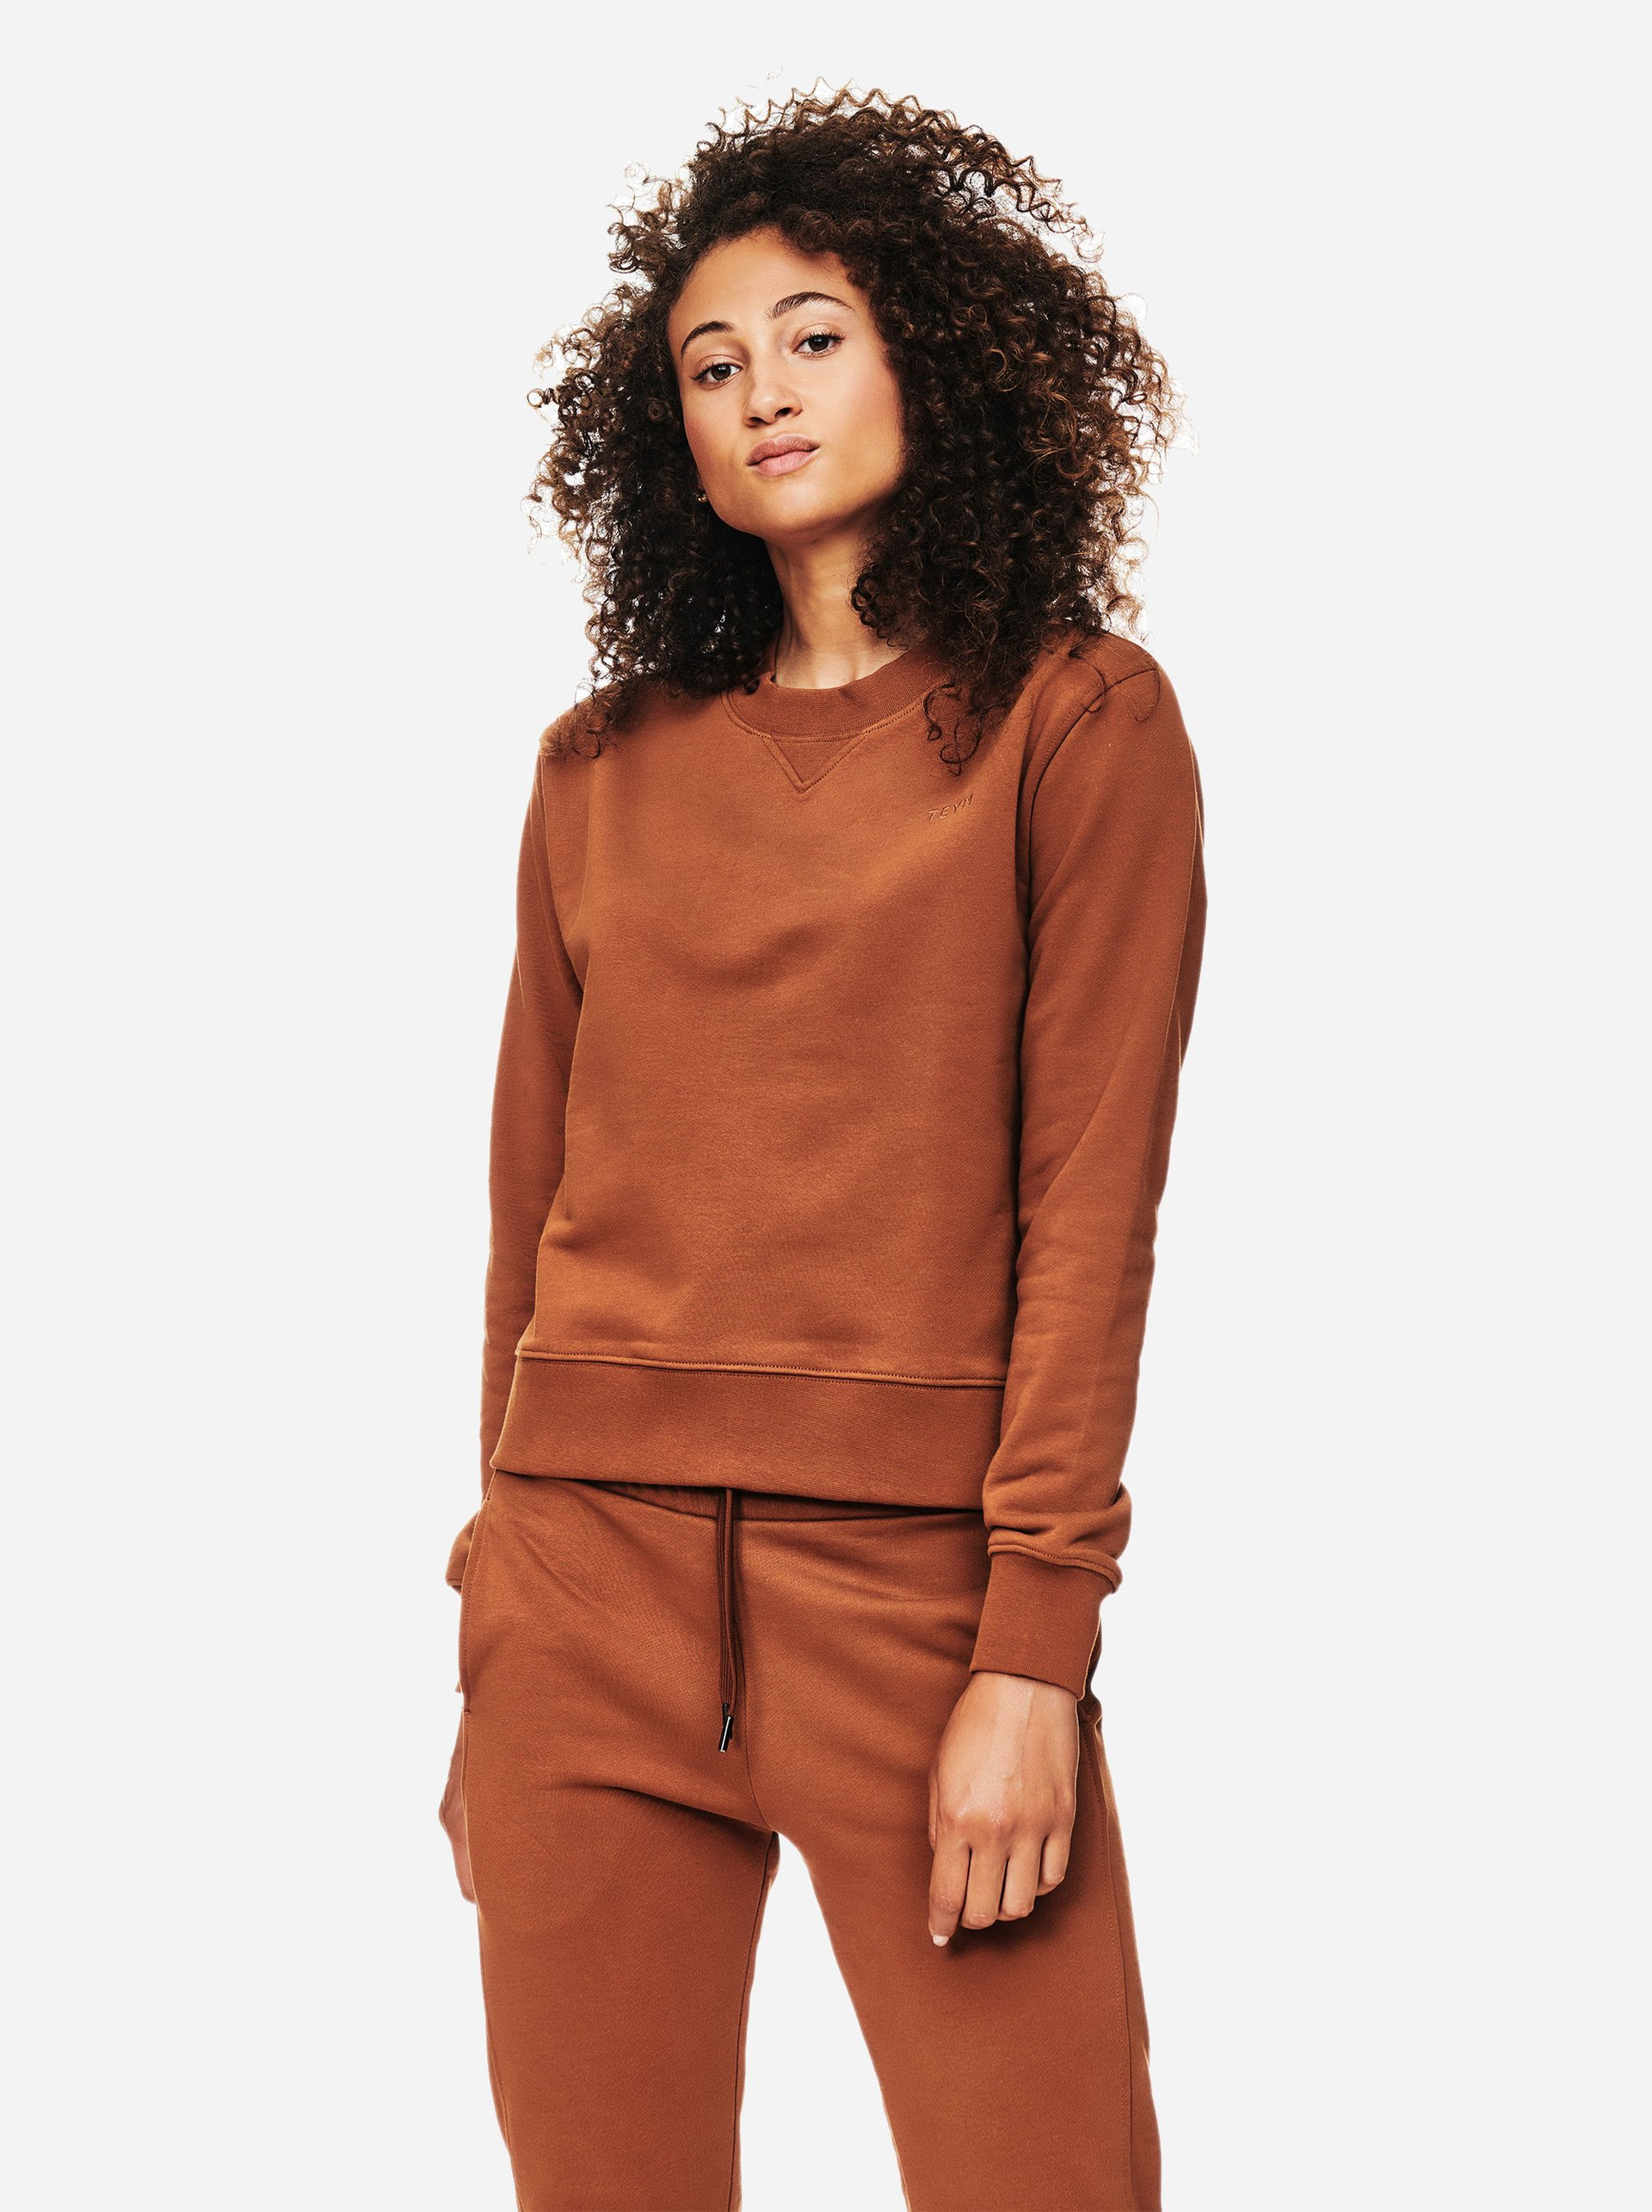 Teym-TheSweatshirt-Women-Camel03